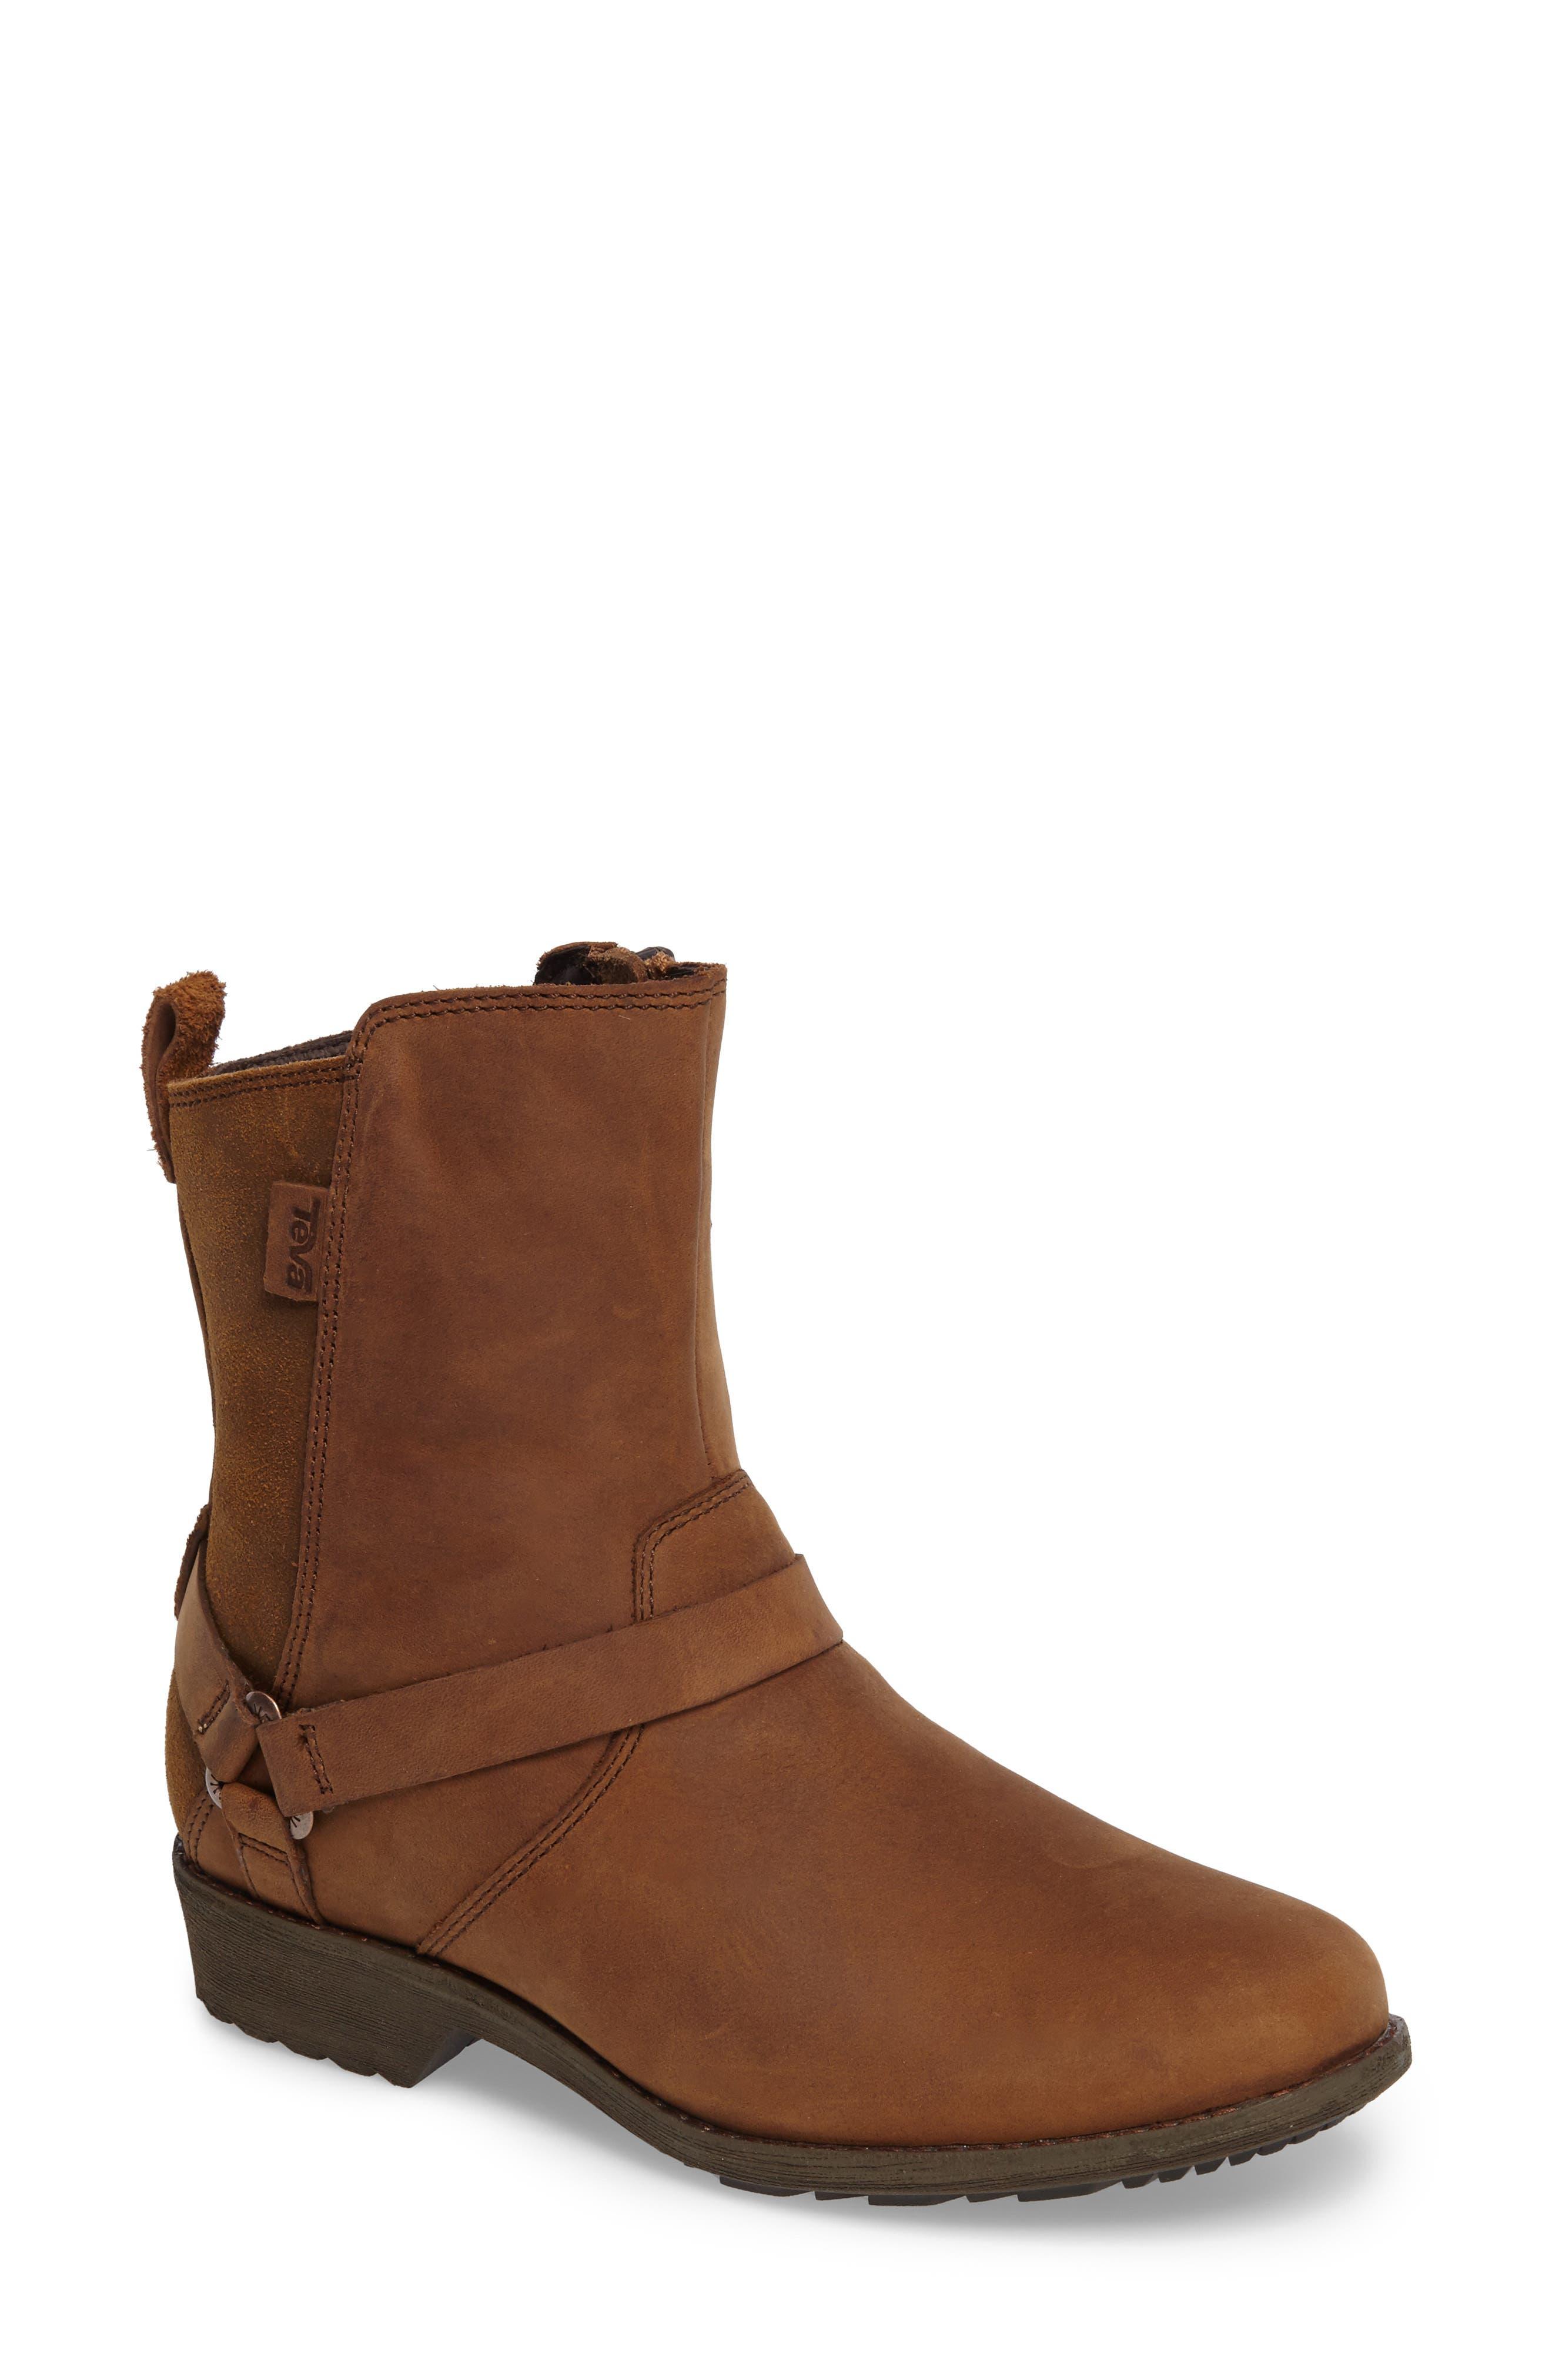 Dina La Vina Dos Waterproof Boot,                             Main thumbnail 1, color,                             Bison Leather